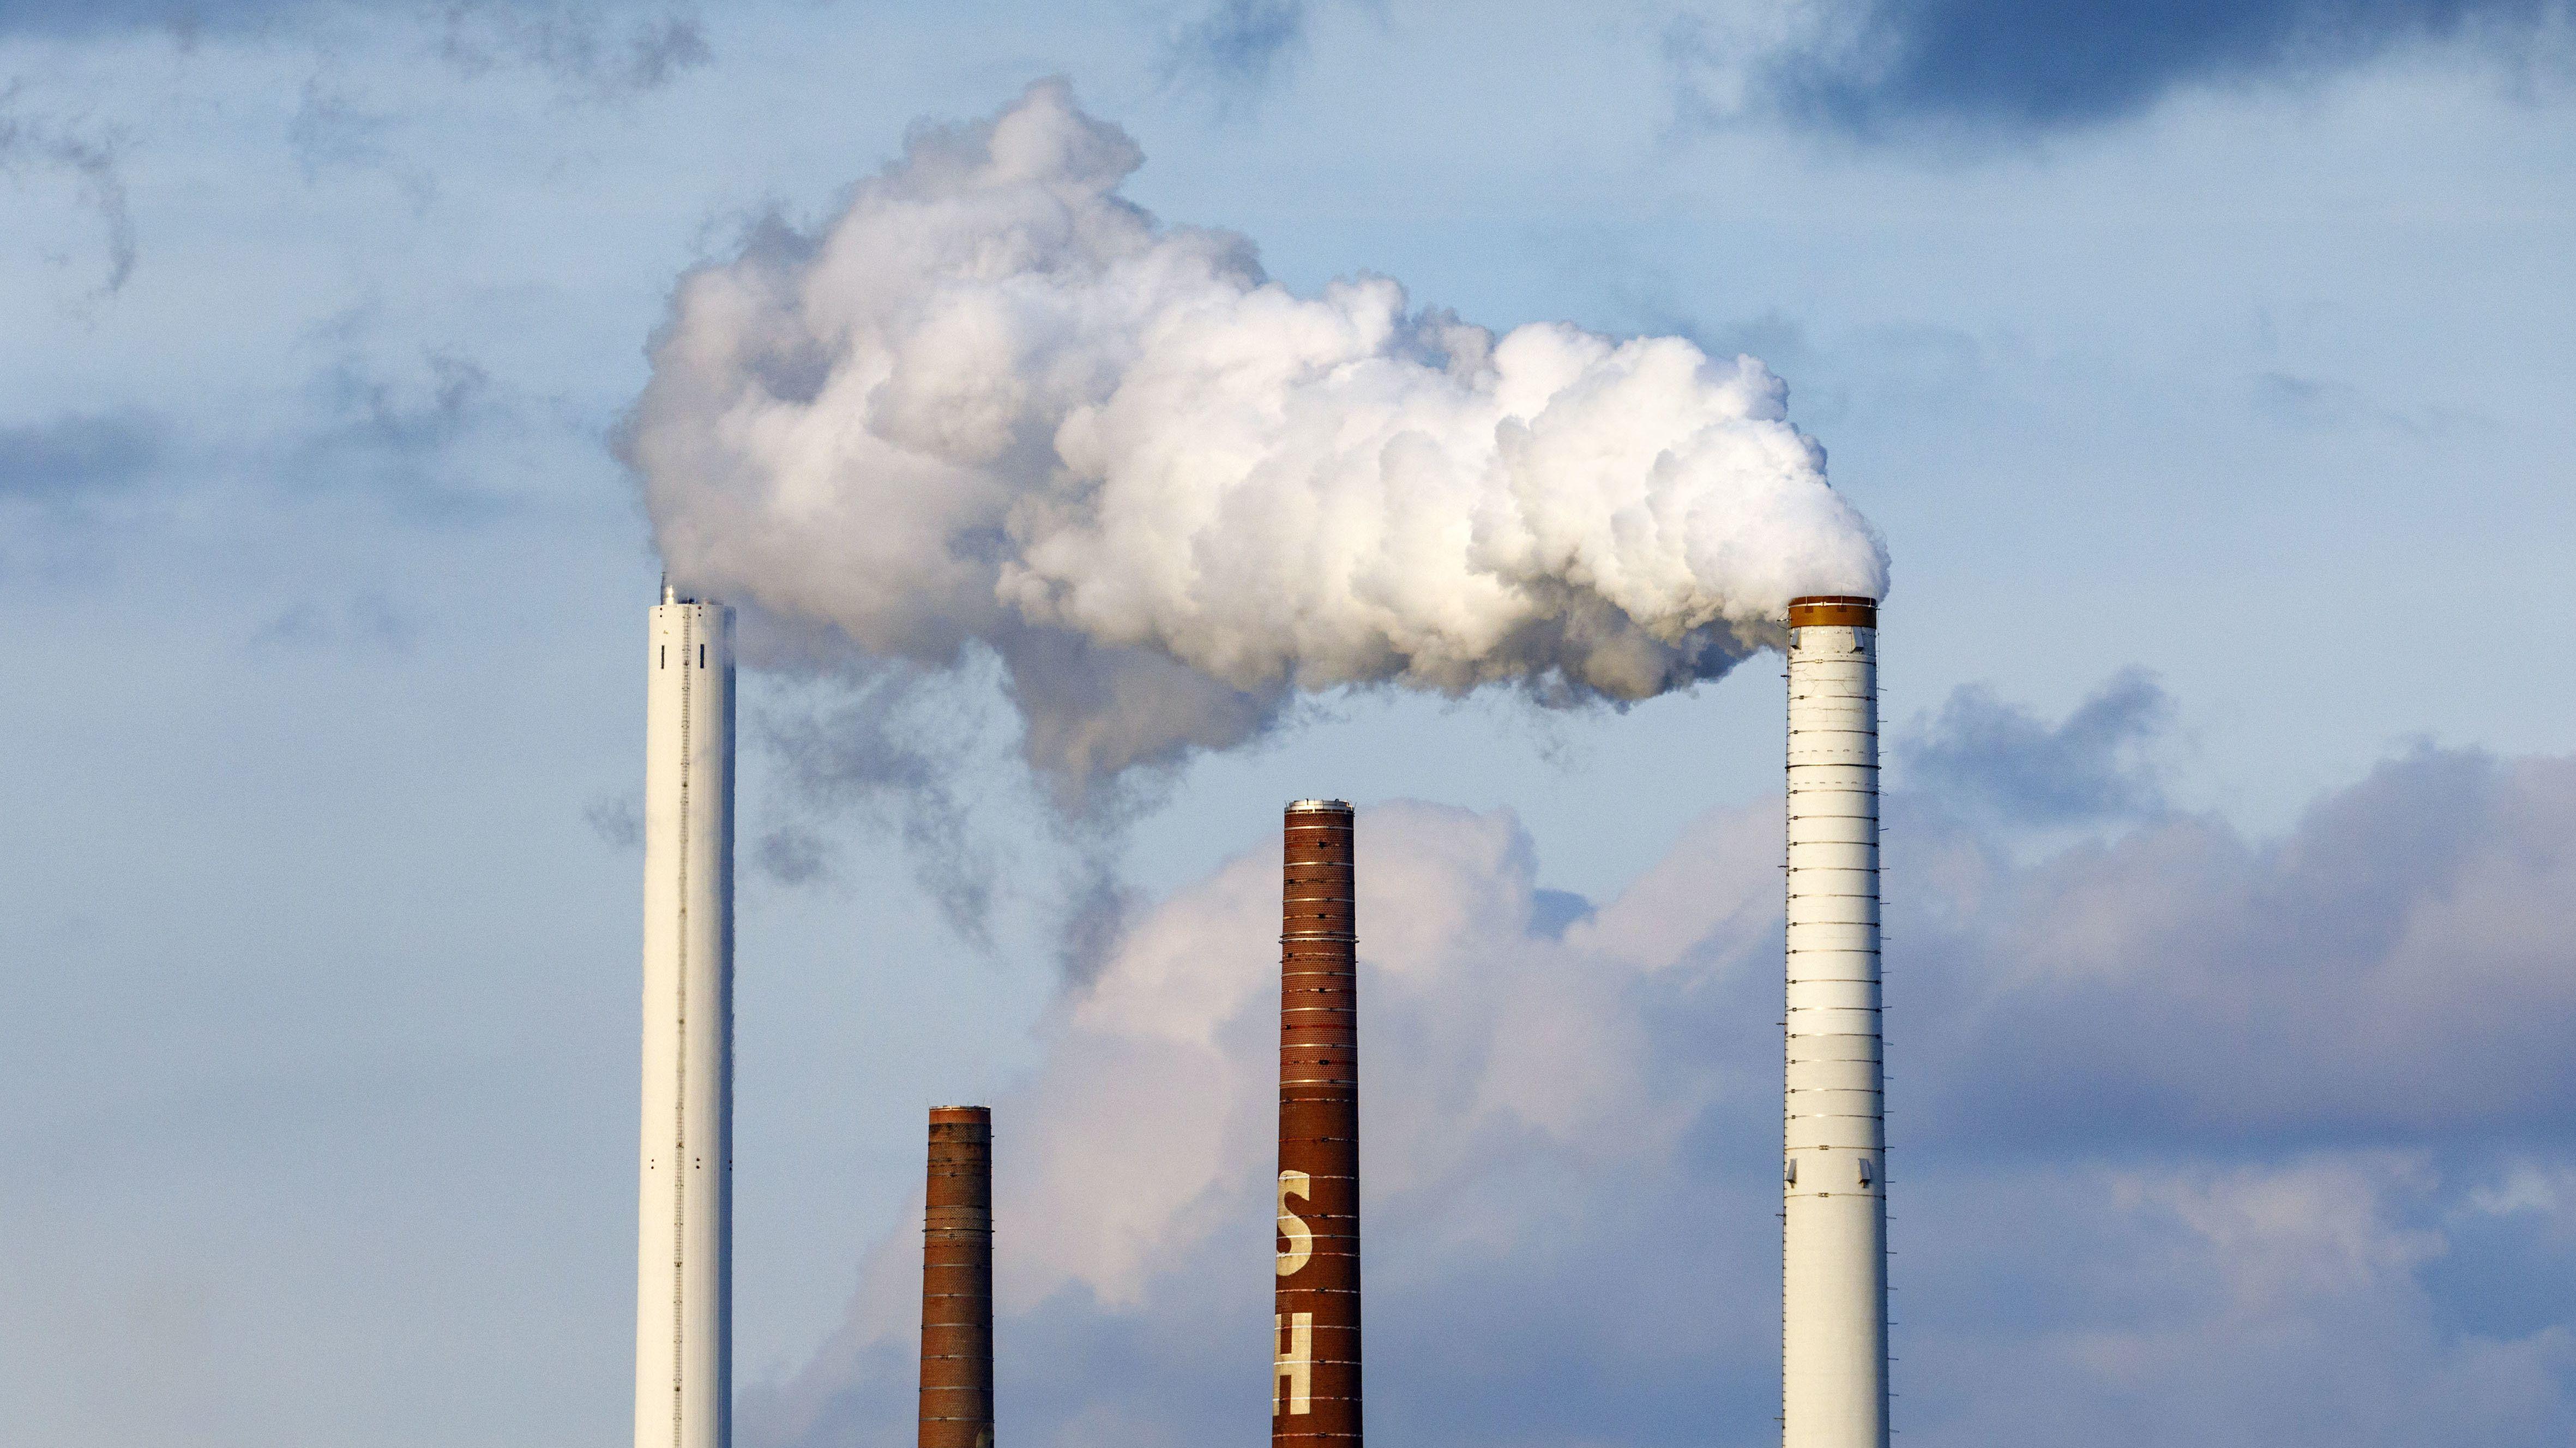 Umstrittene CO2-Steuer: Diskussion im Landtag